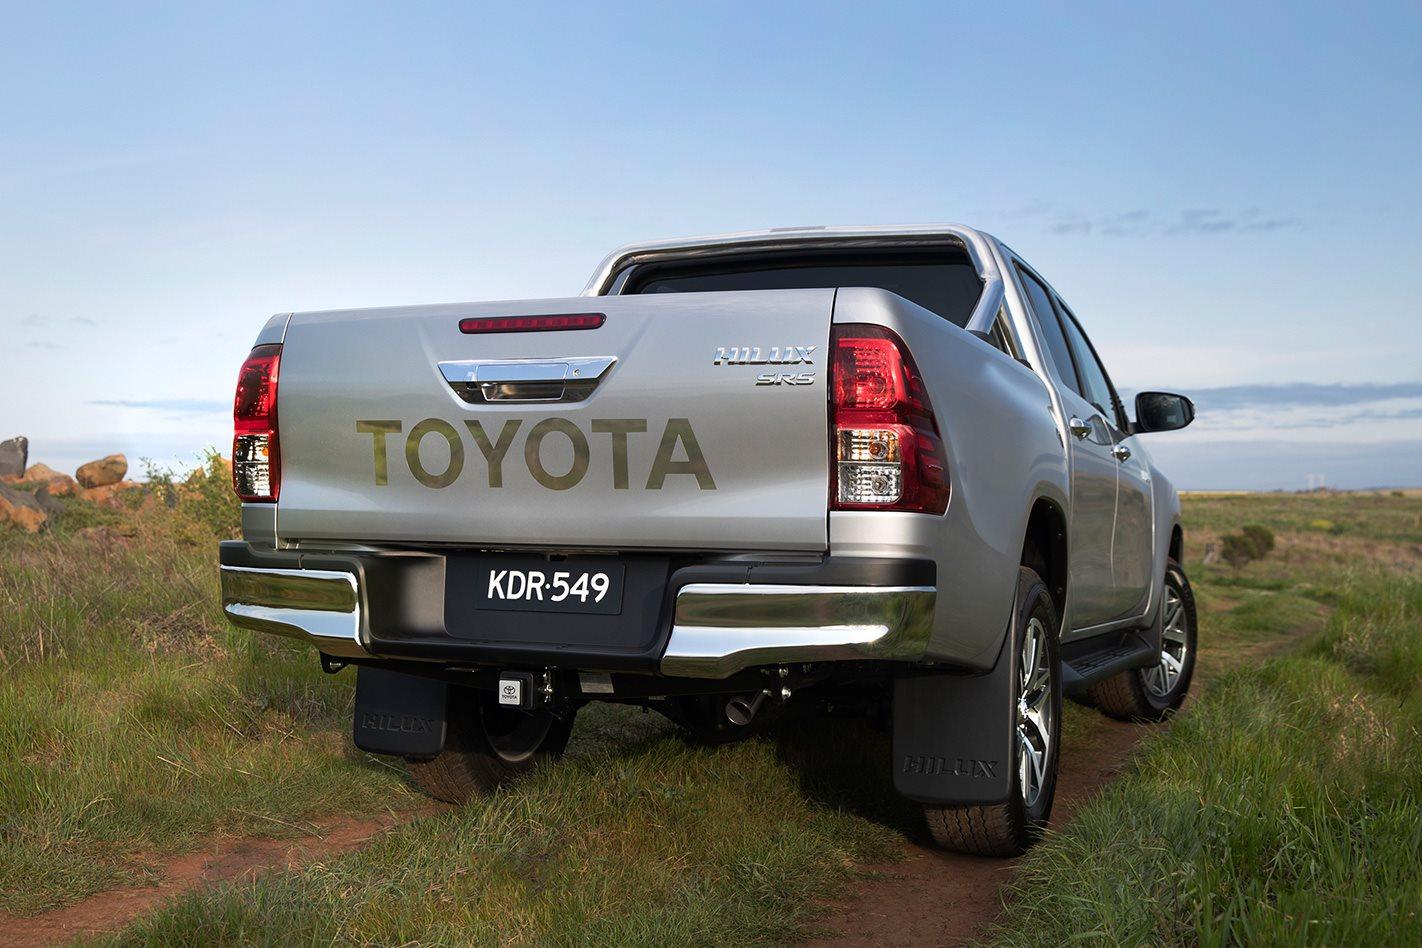 2017-Toyota-Hilux-rear.jpg